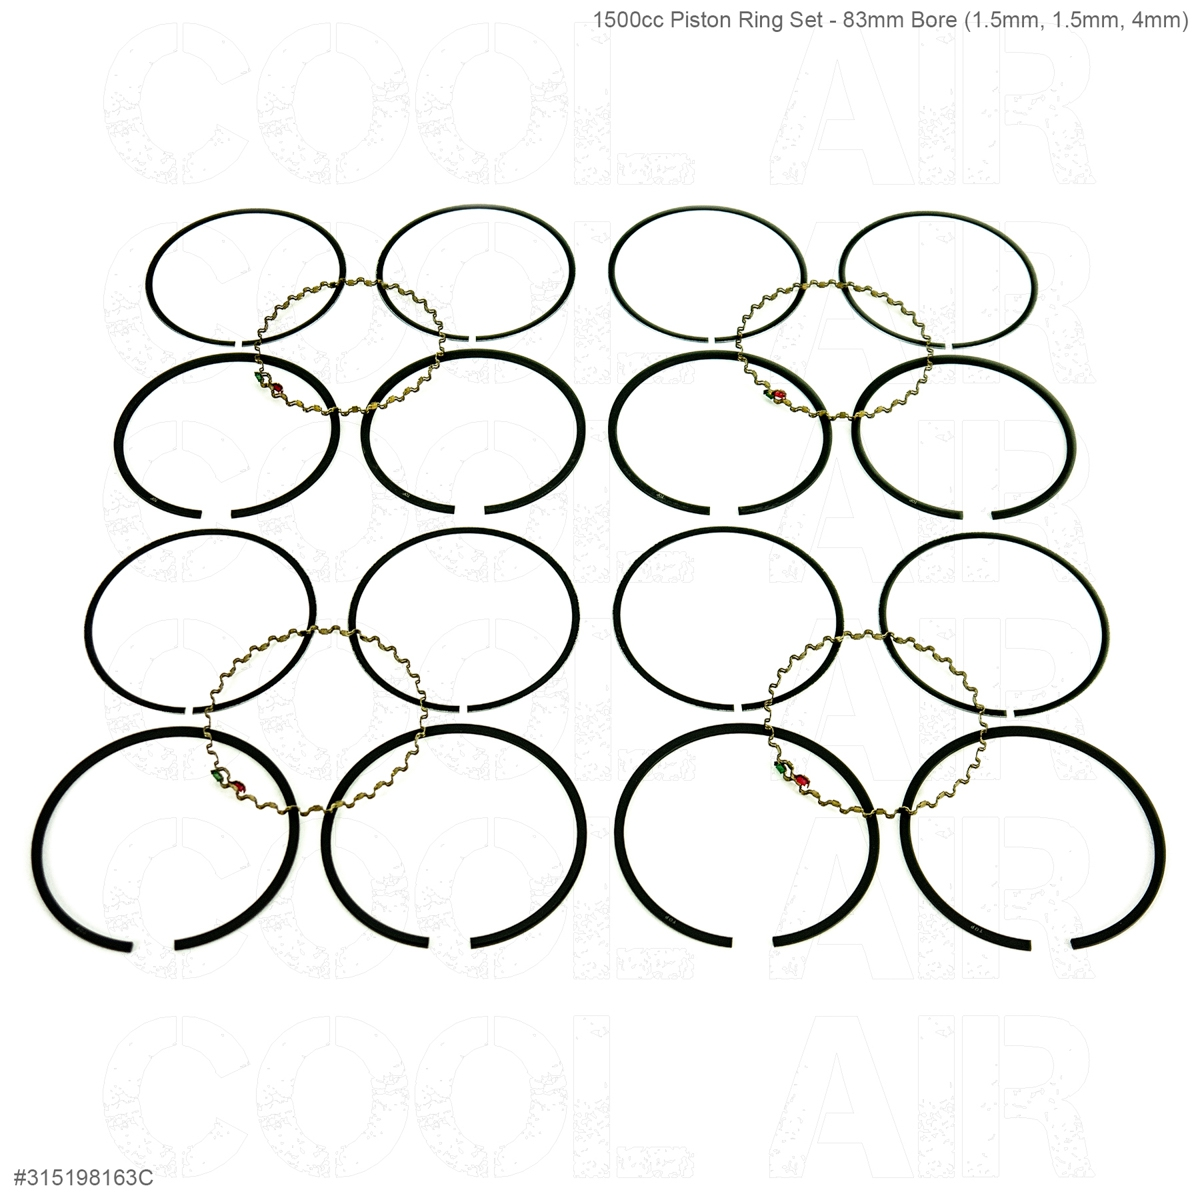 1500cc Piston Ring Set - 83mm Bore (1.5mm, 1.5mm, 4mm)